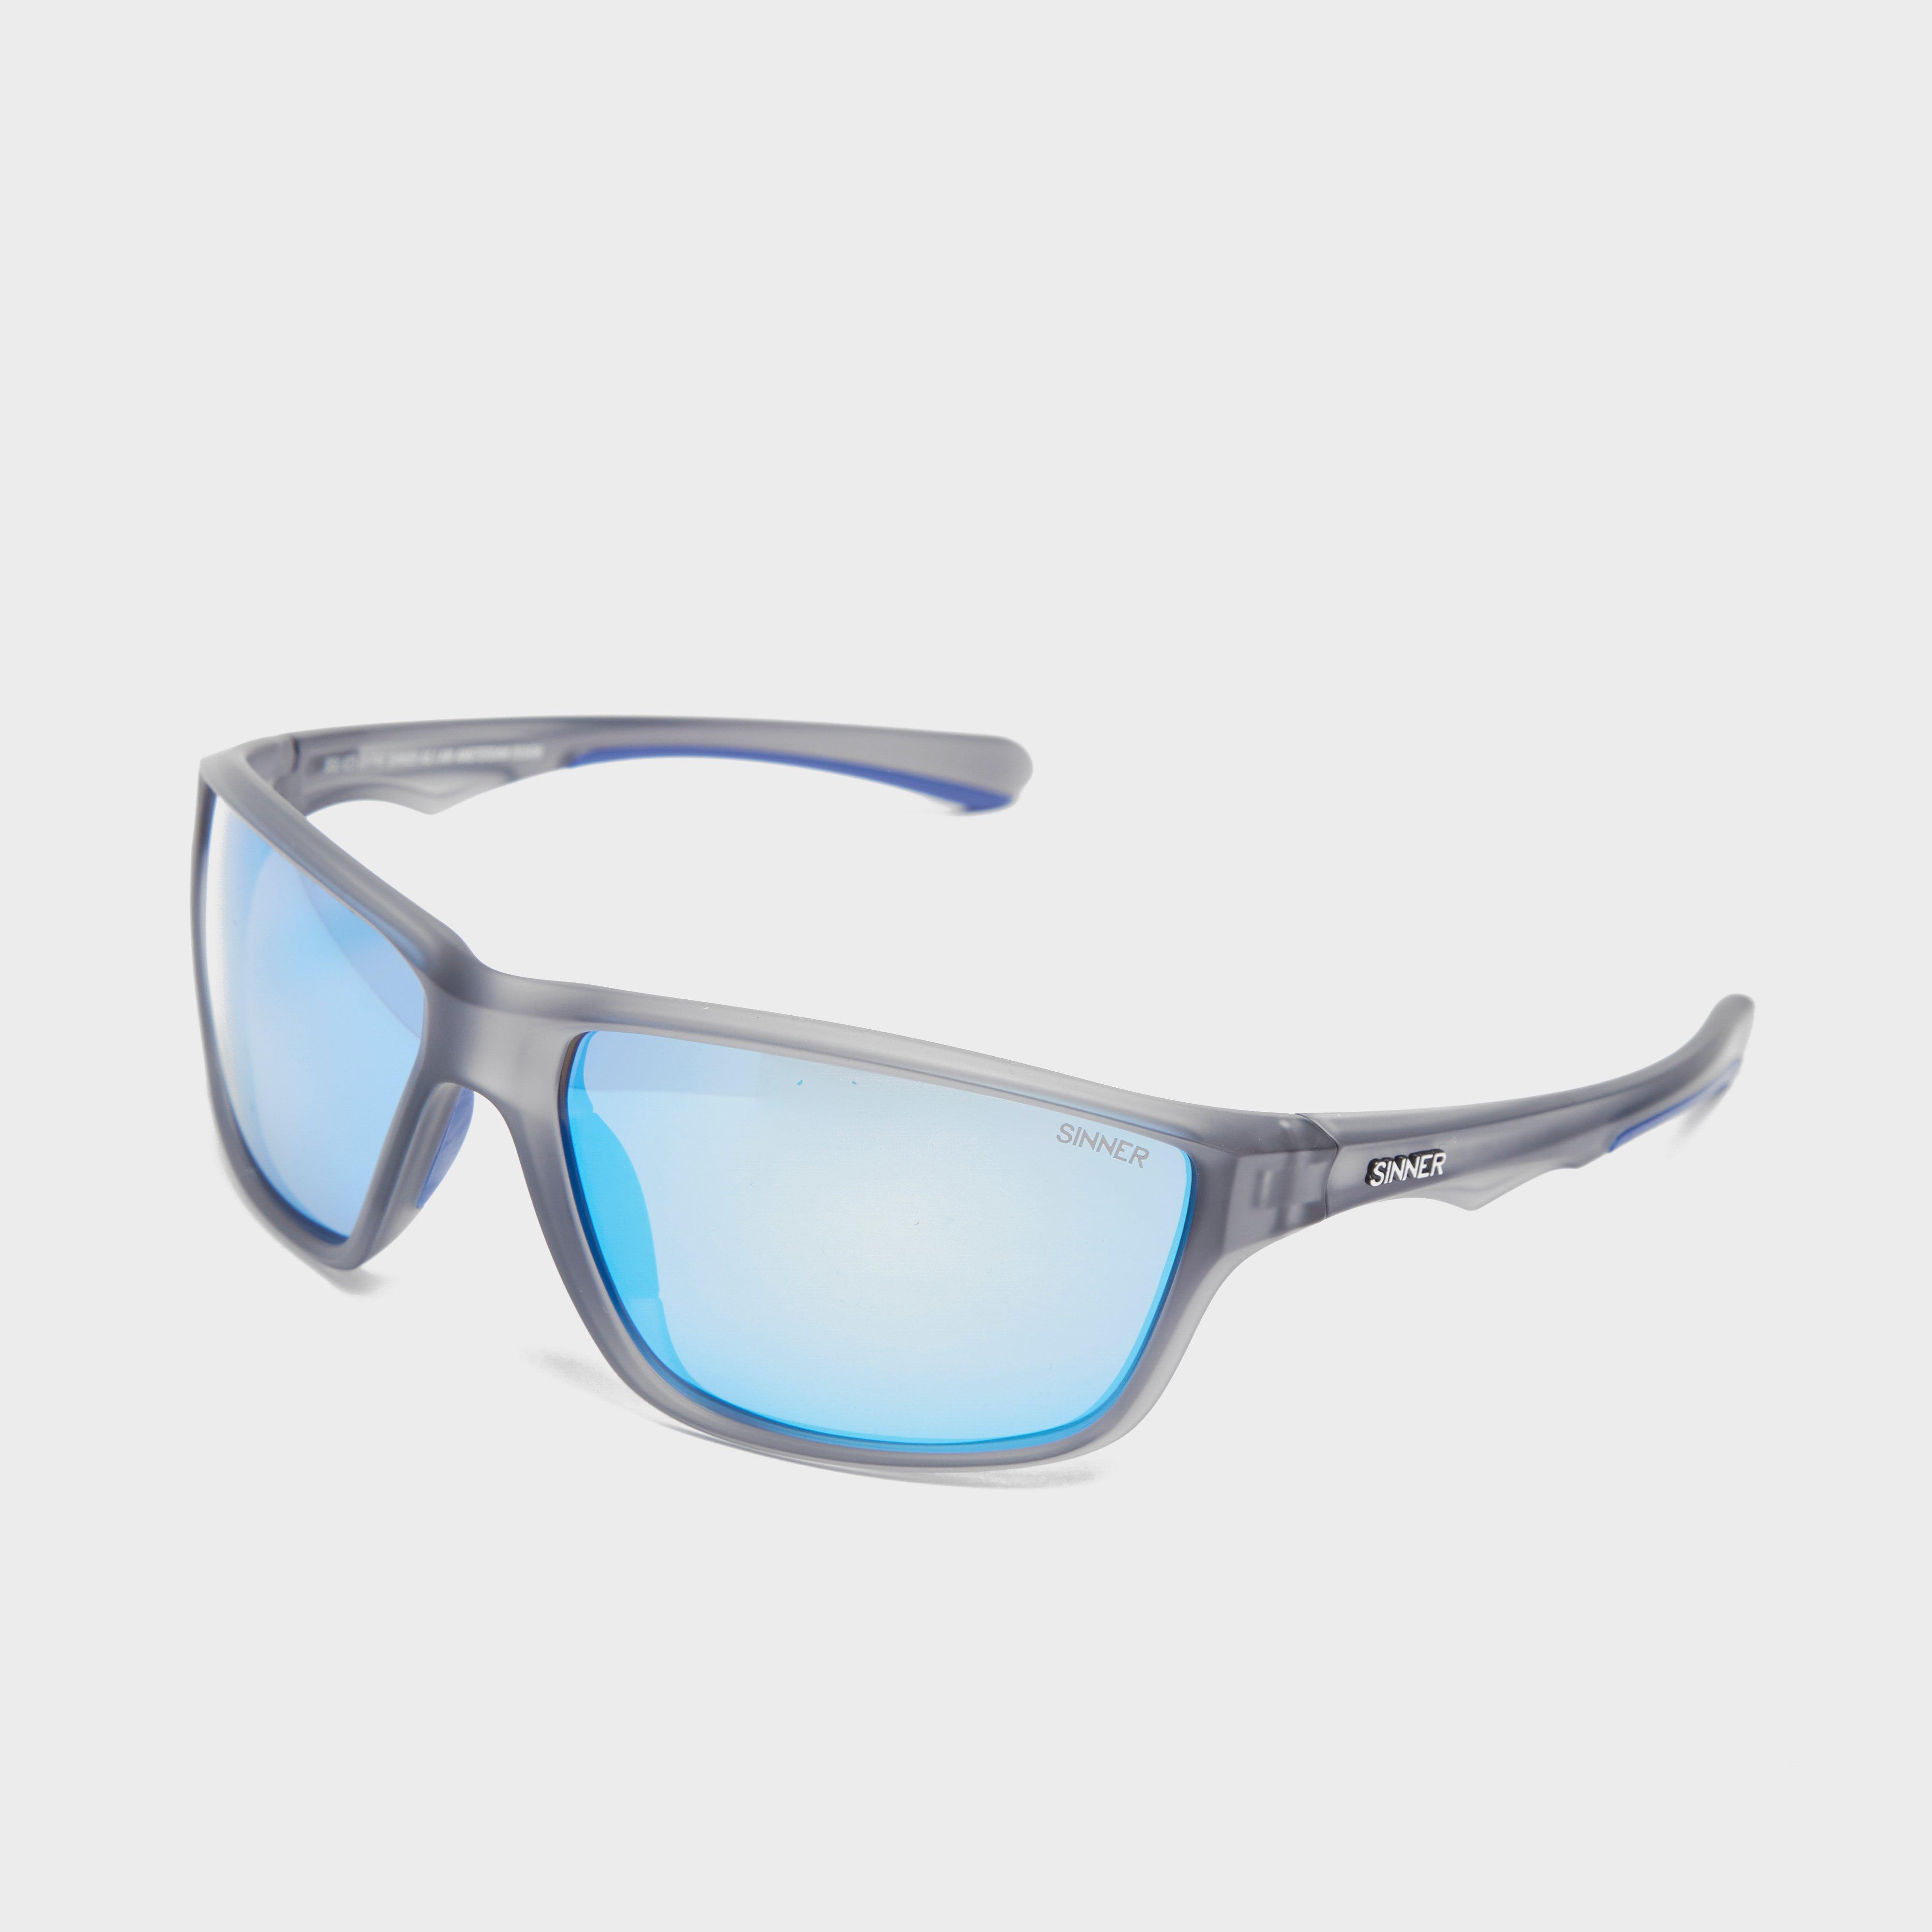 Sinner Sinner Eyak Sunglasses, Grey